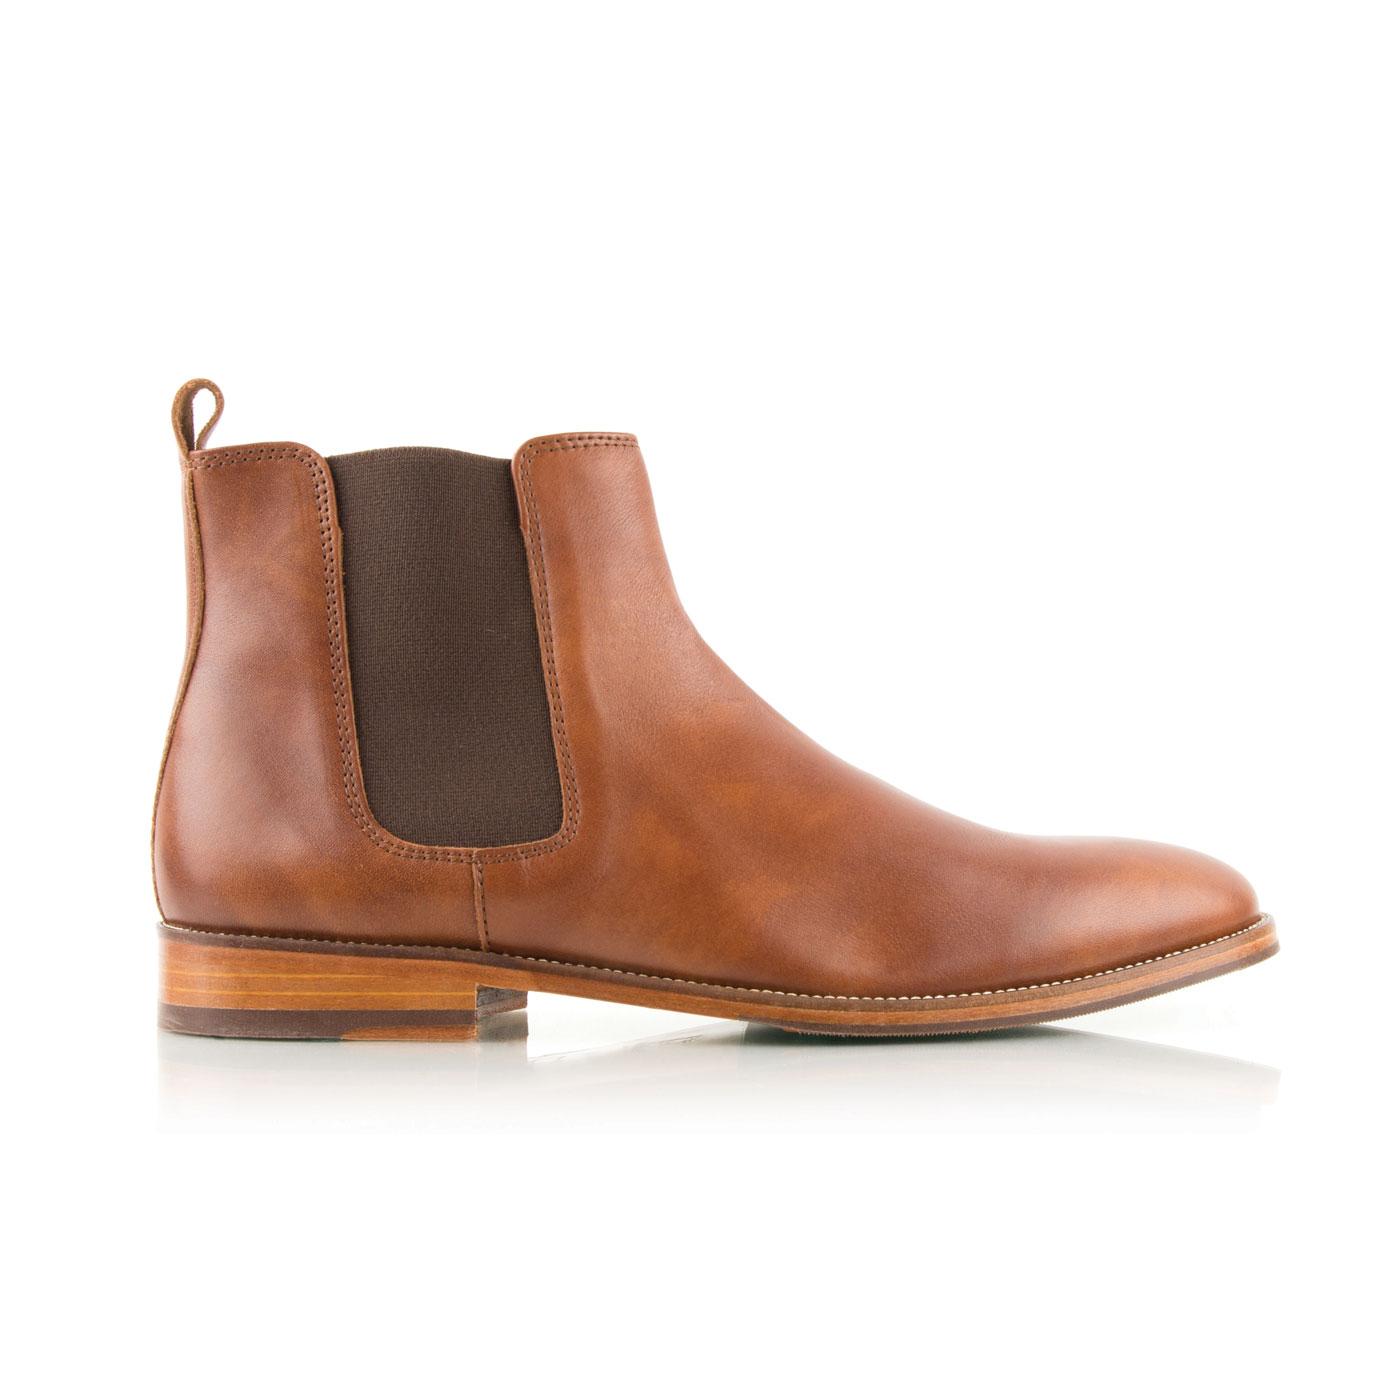 Boots à élastique L'HORLOGER Cognac